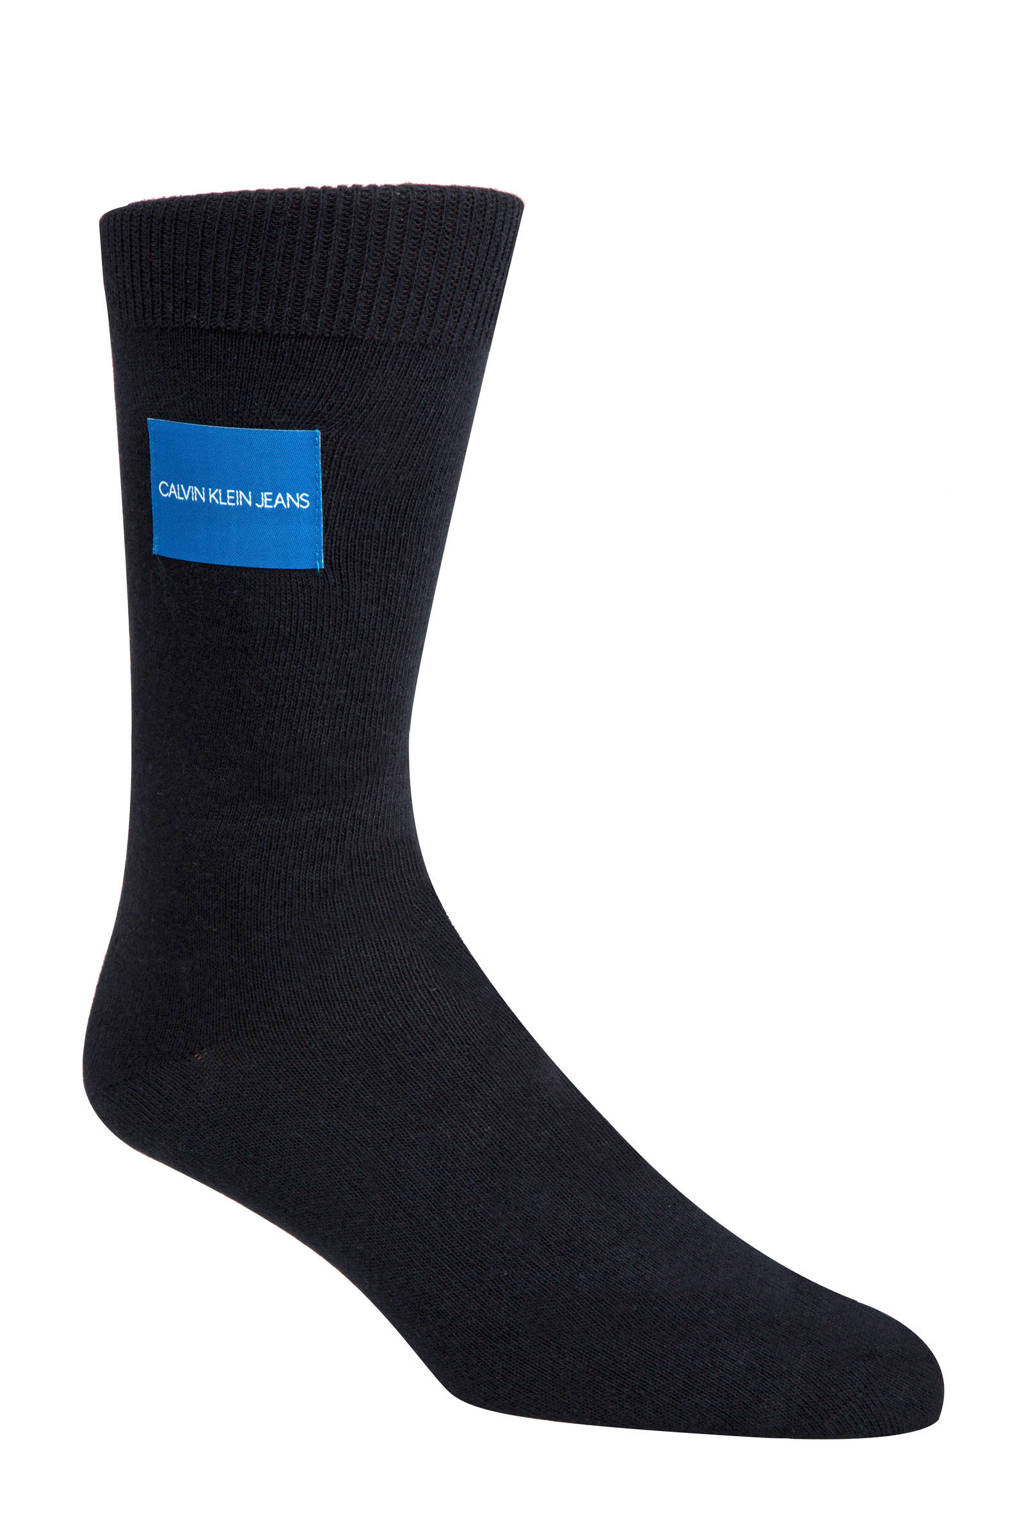 Calvin Klein sokken marine, Marine